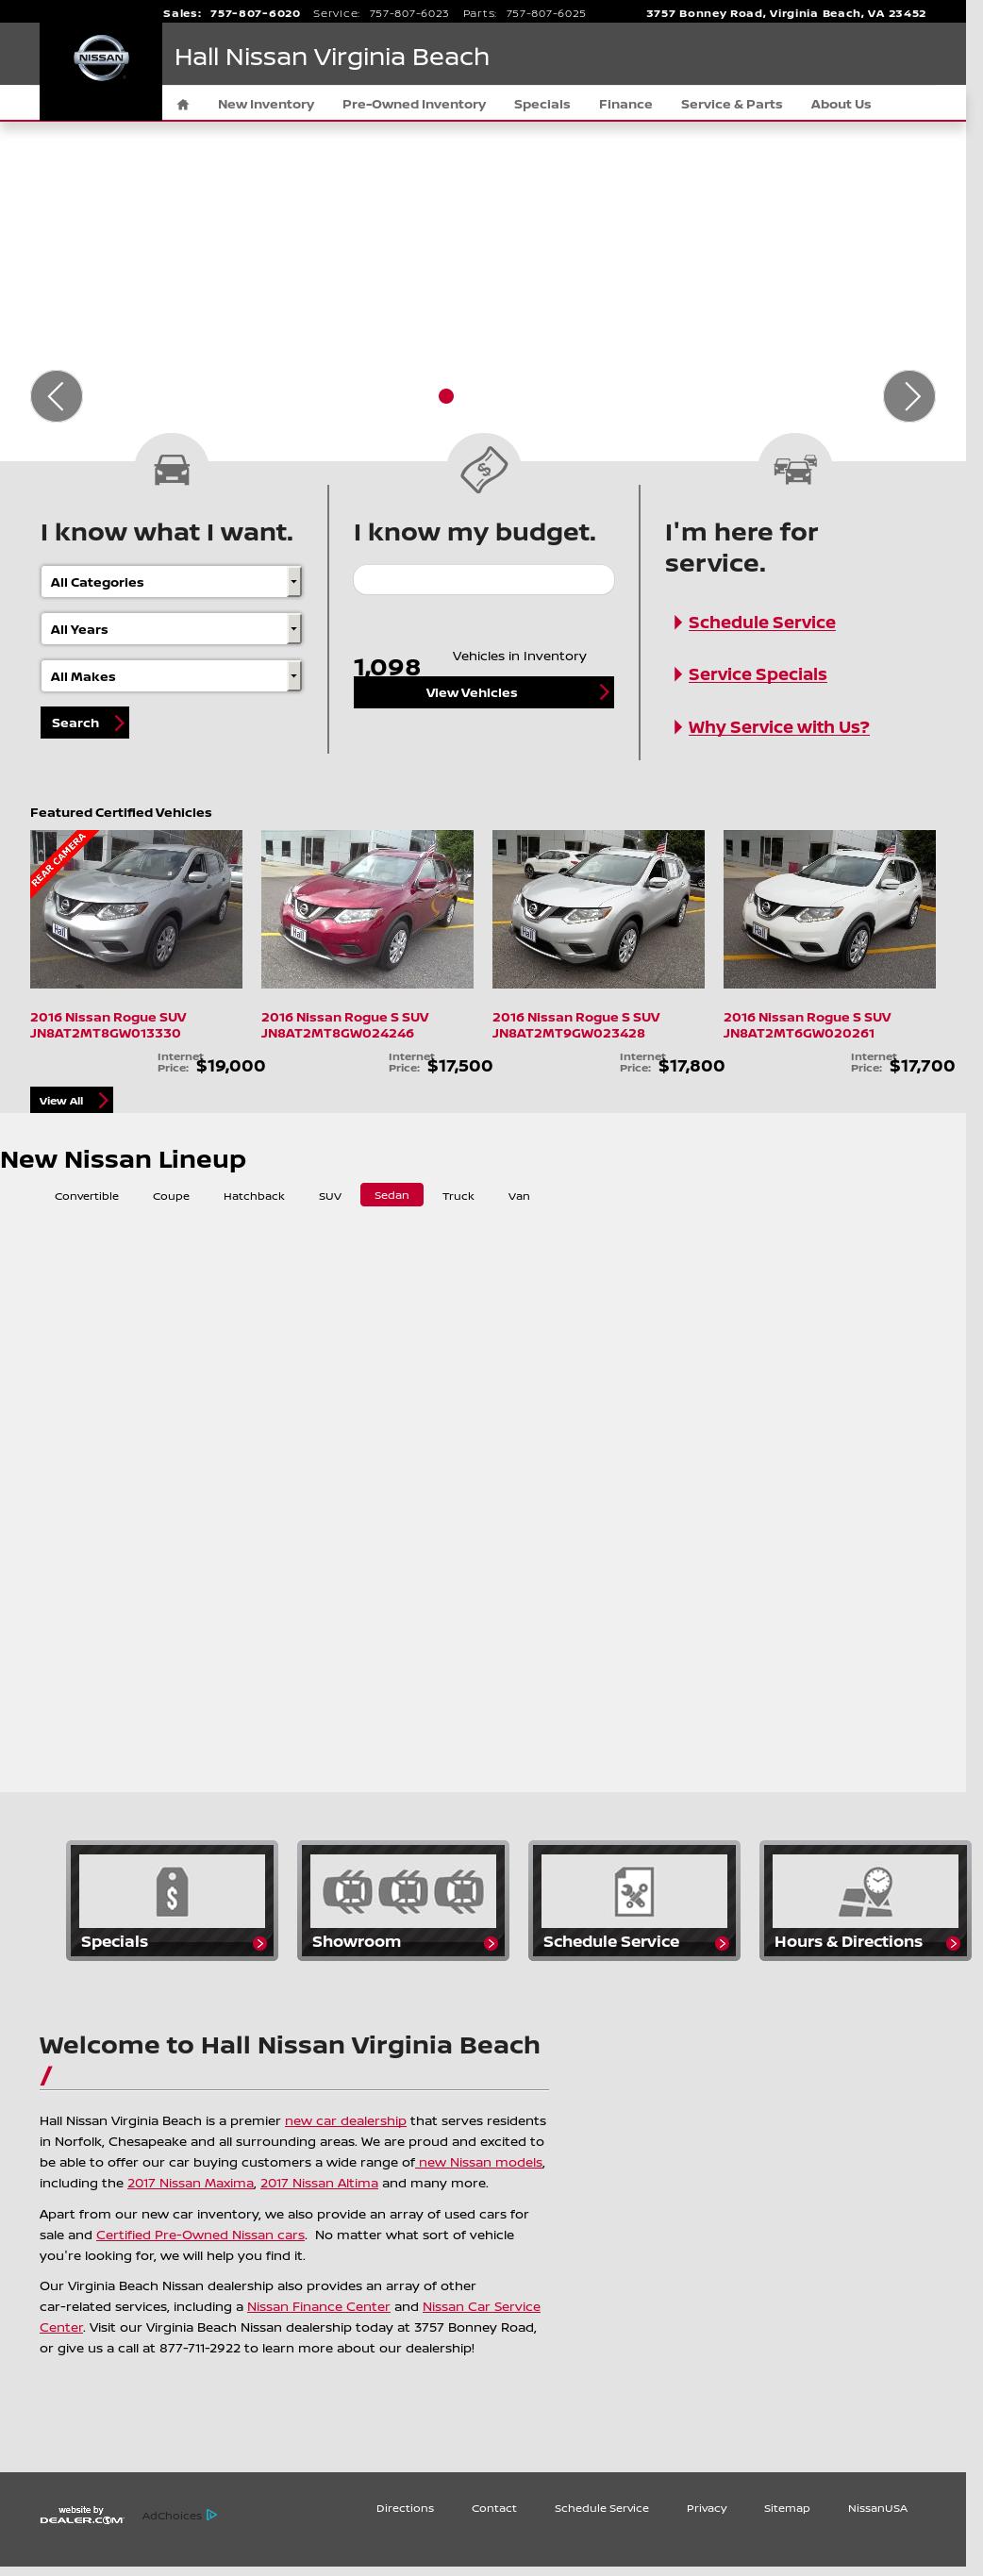 Hall Nissan Of Virginia Beach Website History